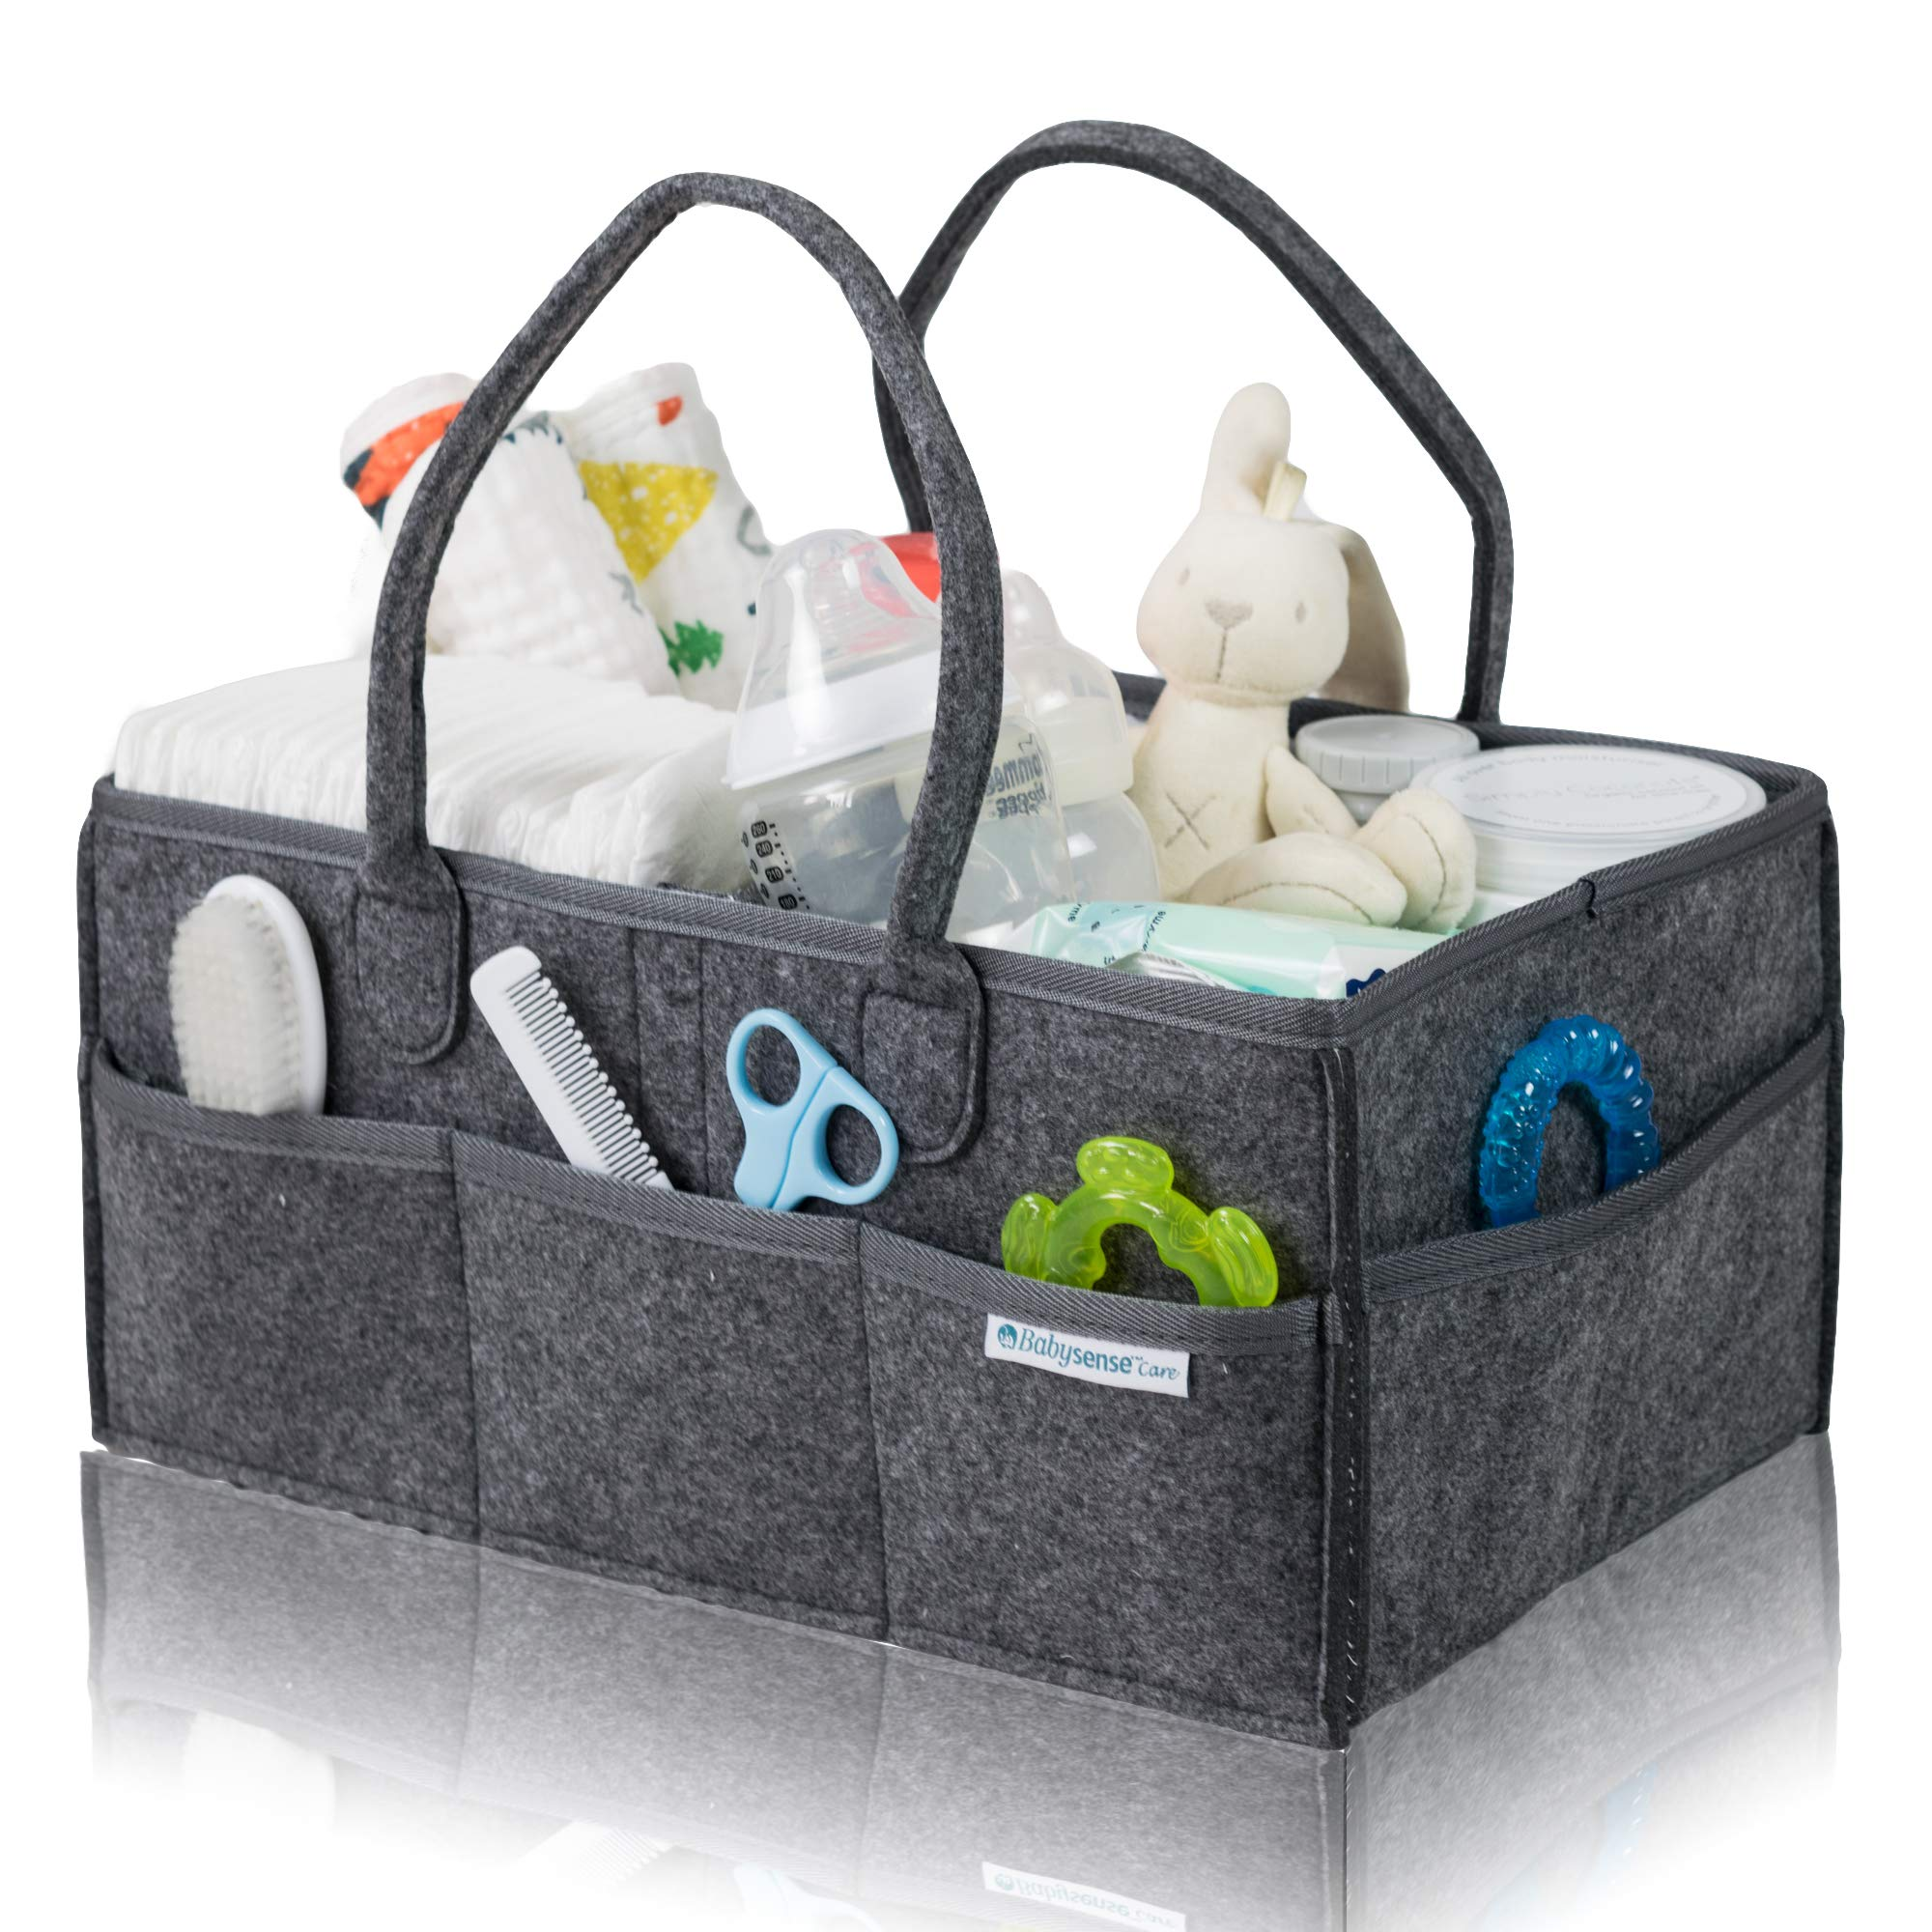 Baby Diaper Caddy Organizer Large by Babysense Care | Foldable Basket Nursery Essentials Storage Bin for Changing Table | Car Travel Portable Holder Bag ● Dark Grey by Babysense